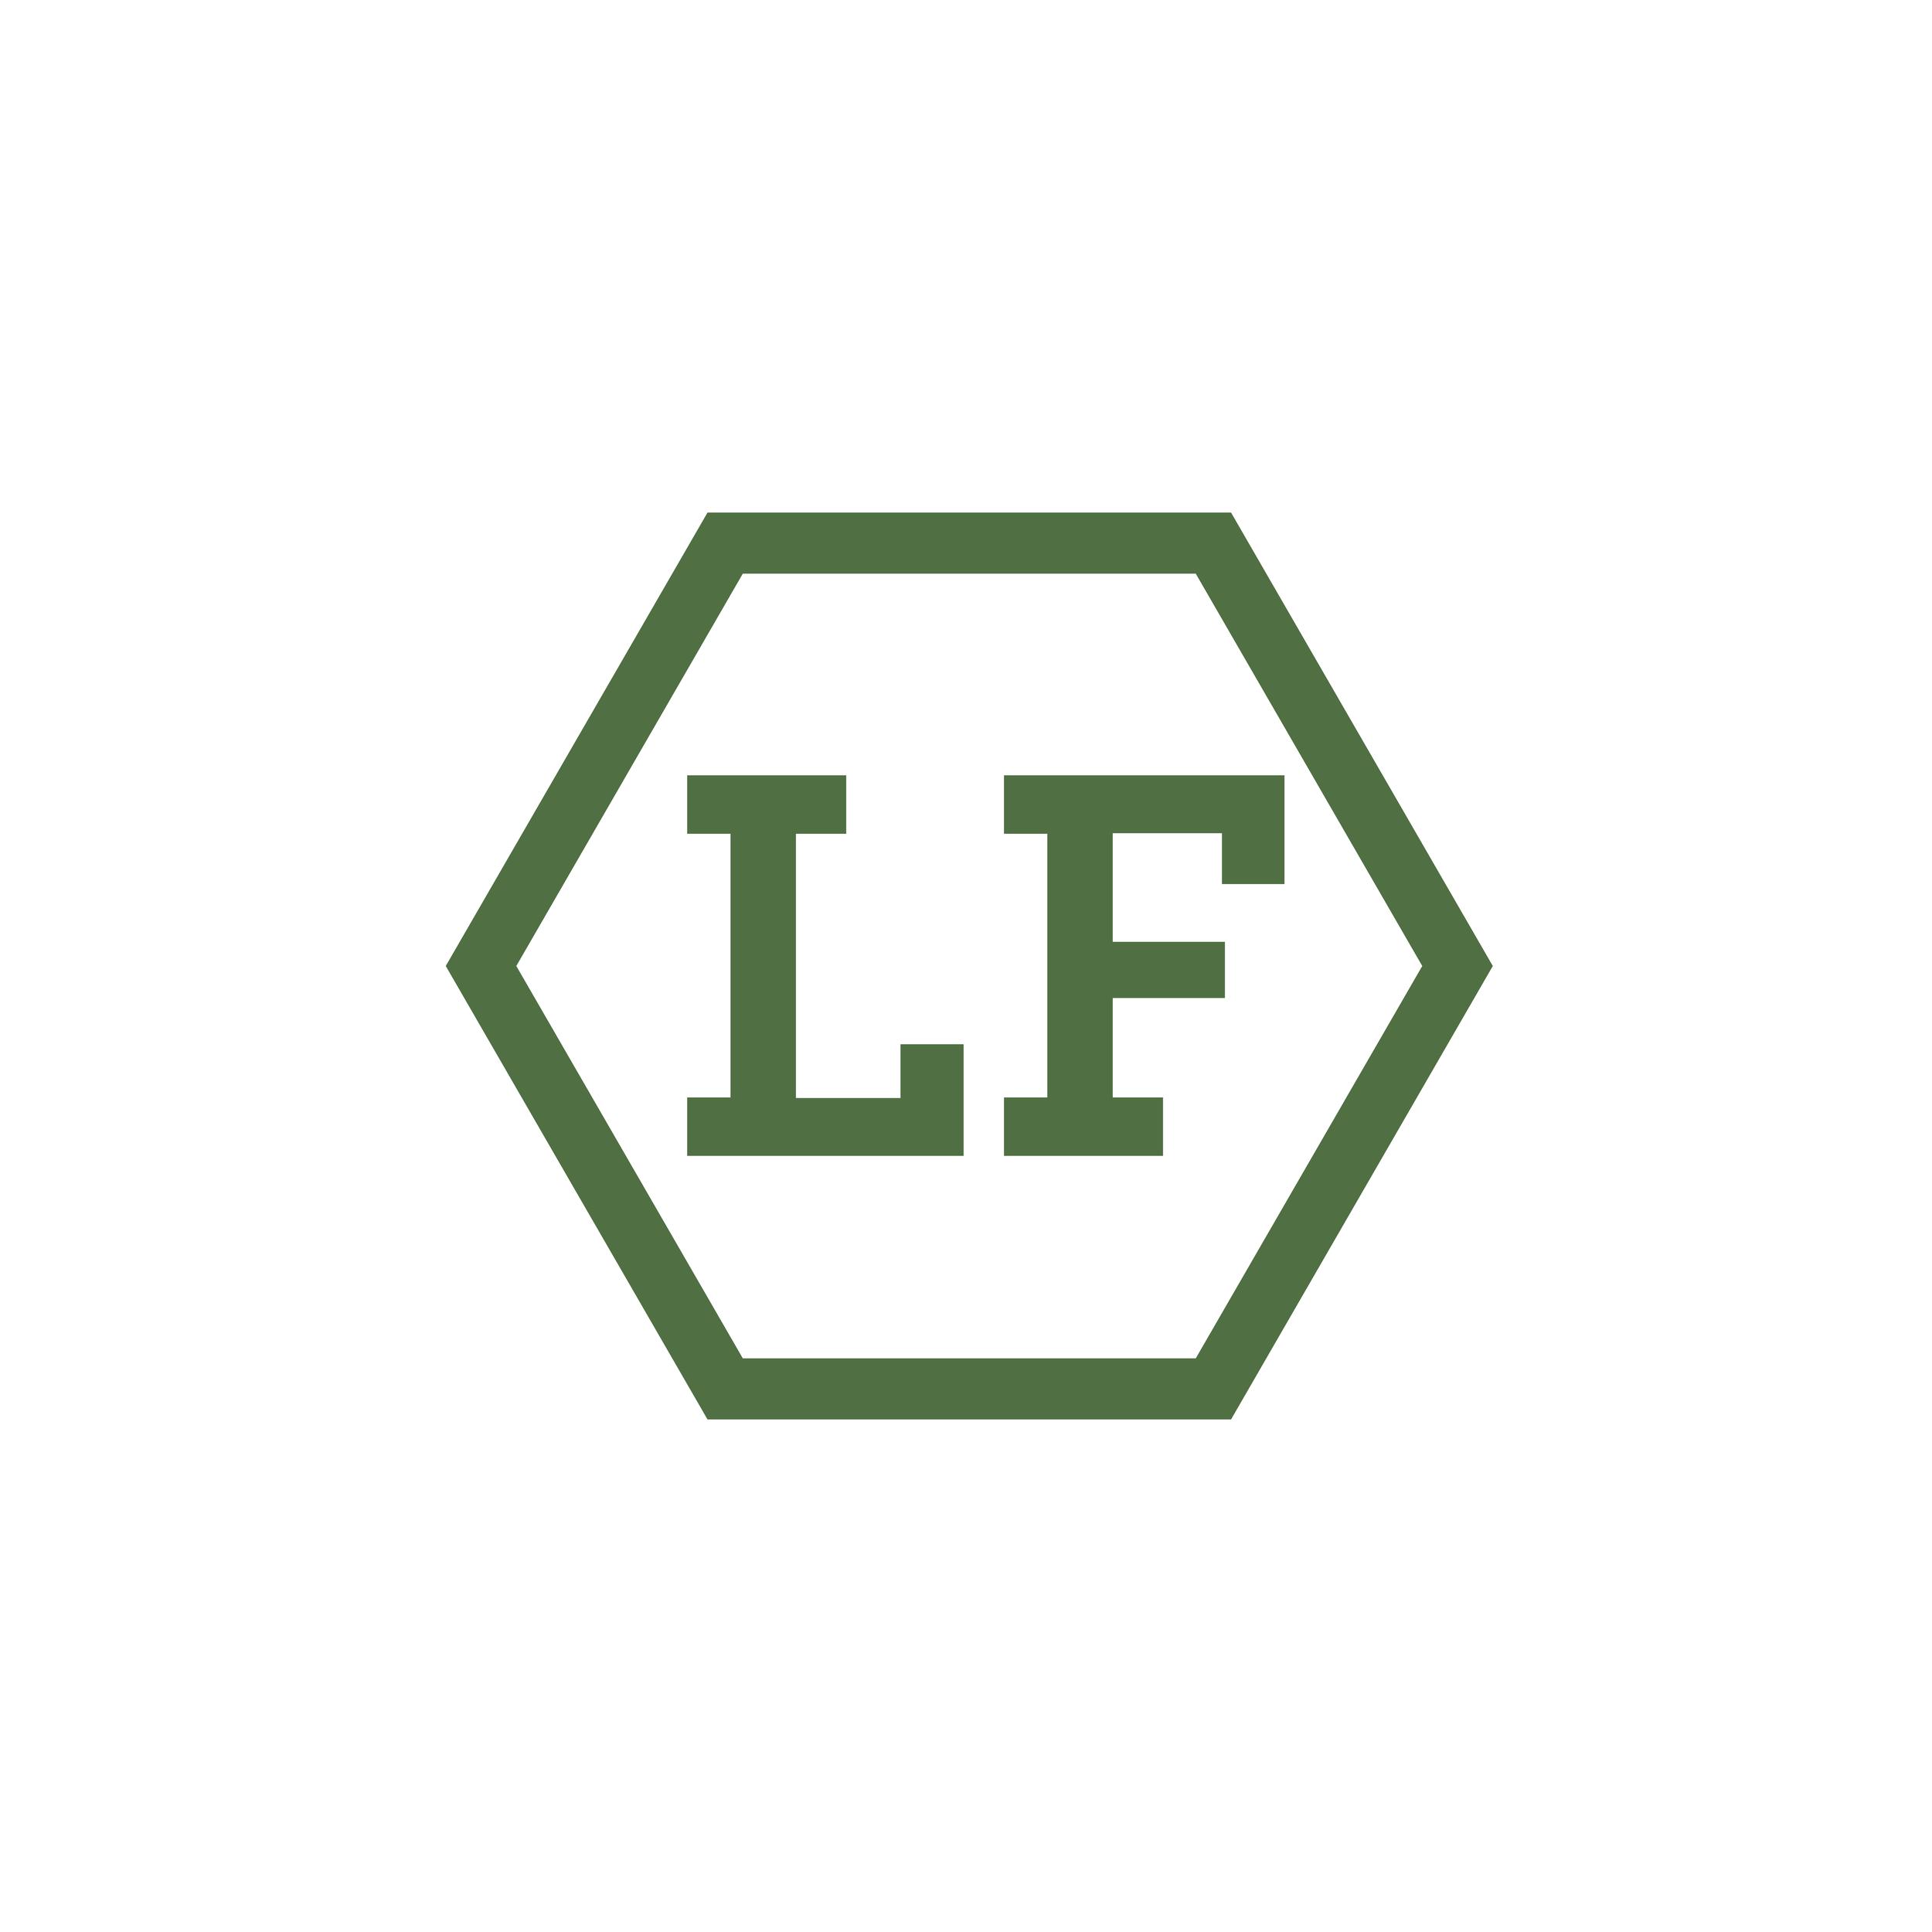 Blog website design and logo by Hagan Design Co Champaign Illinois